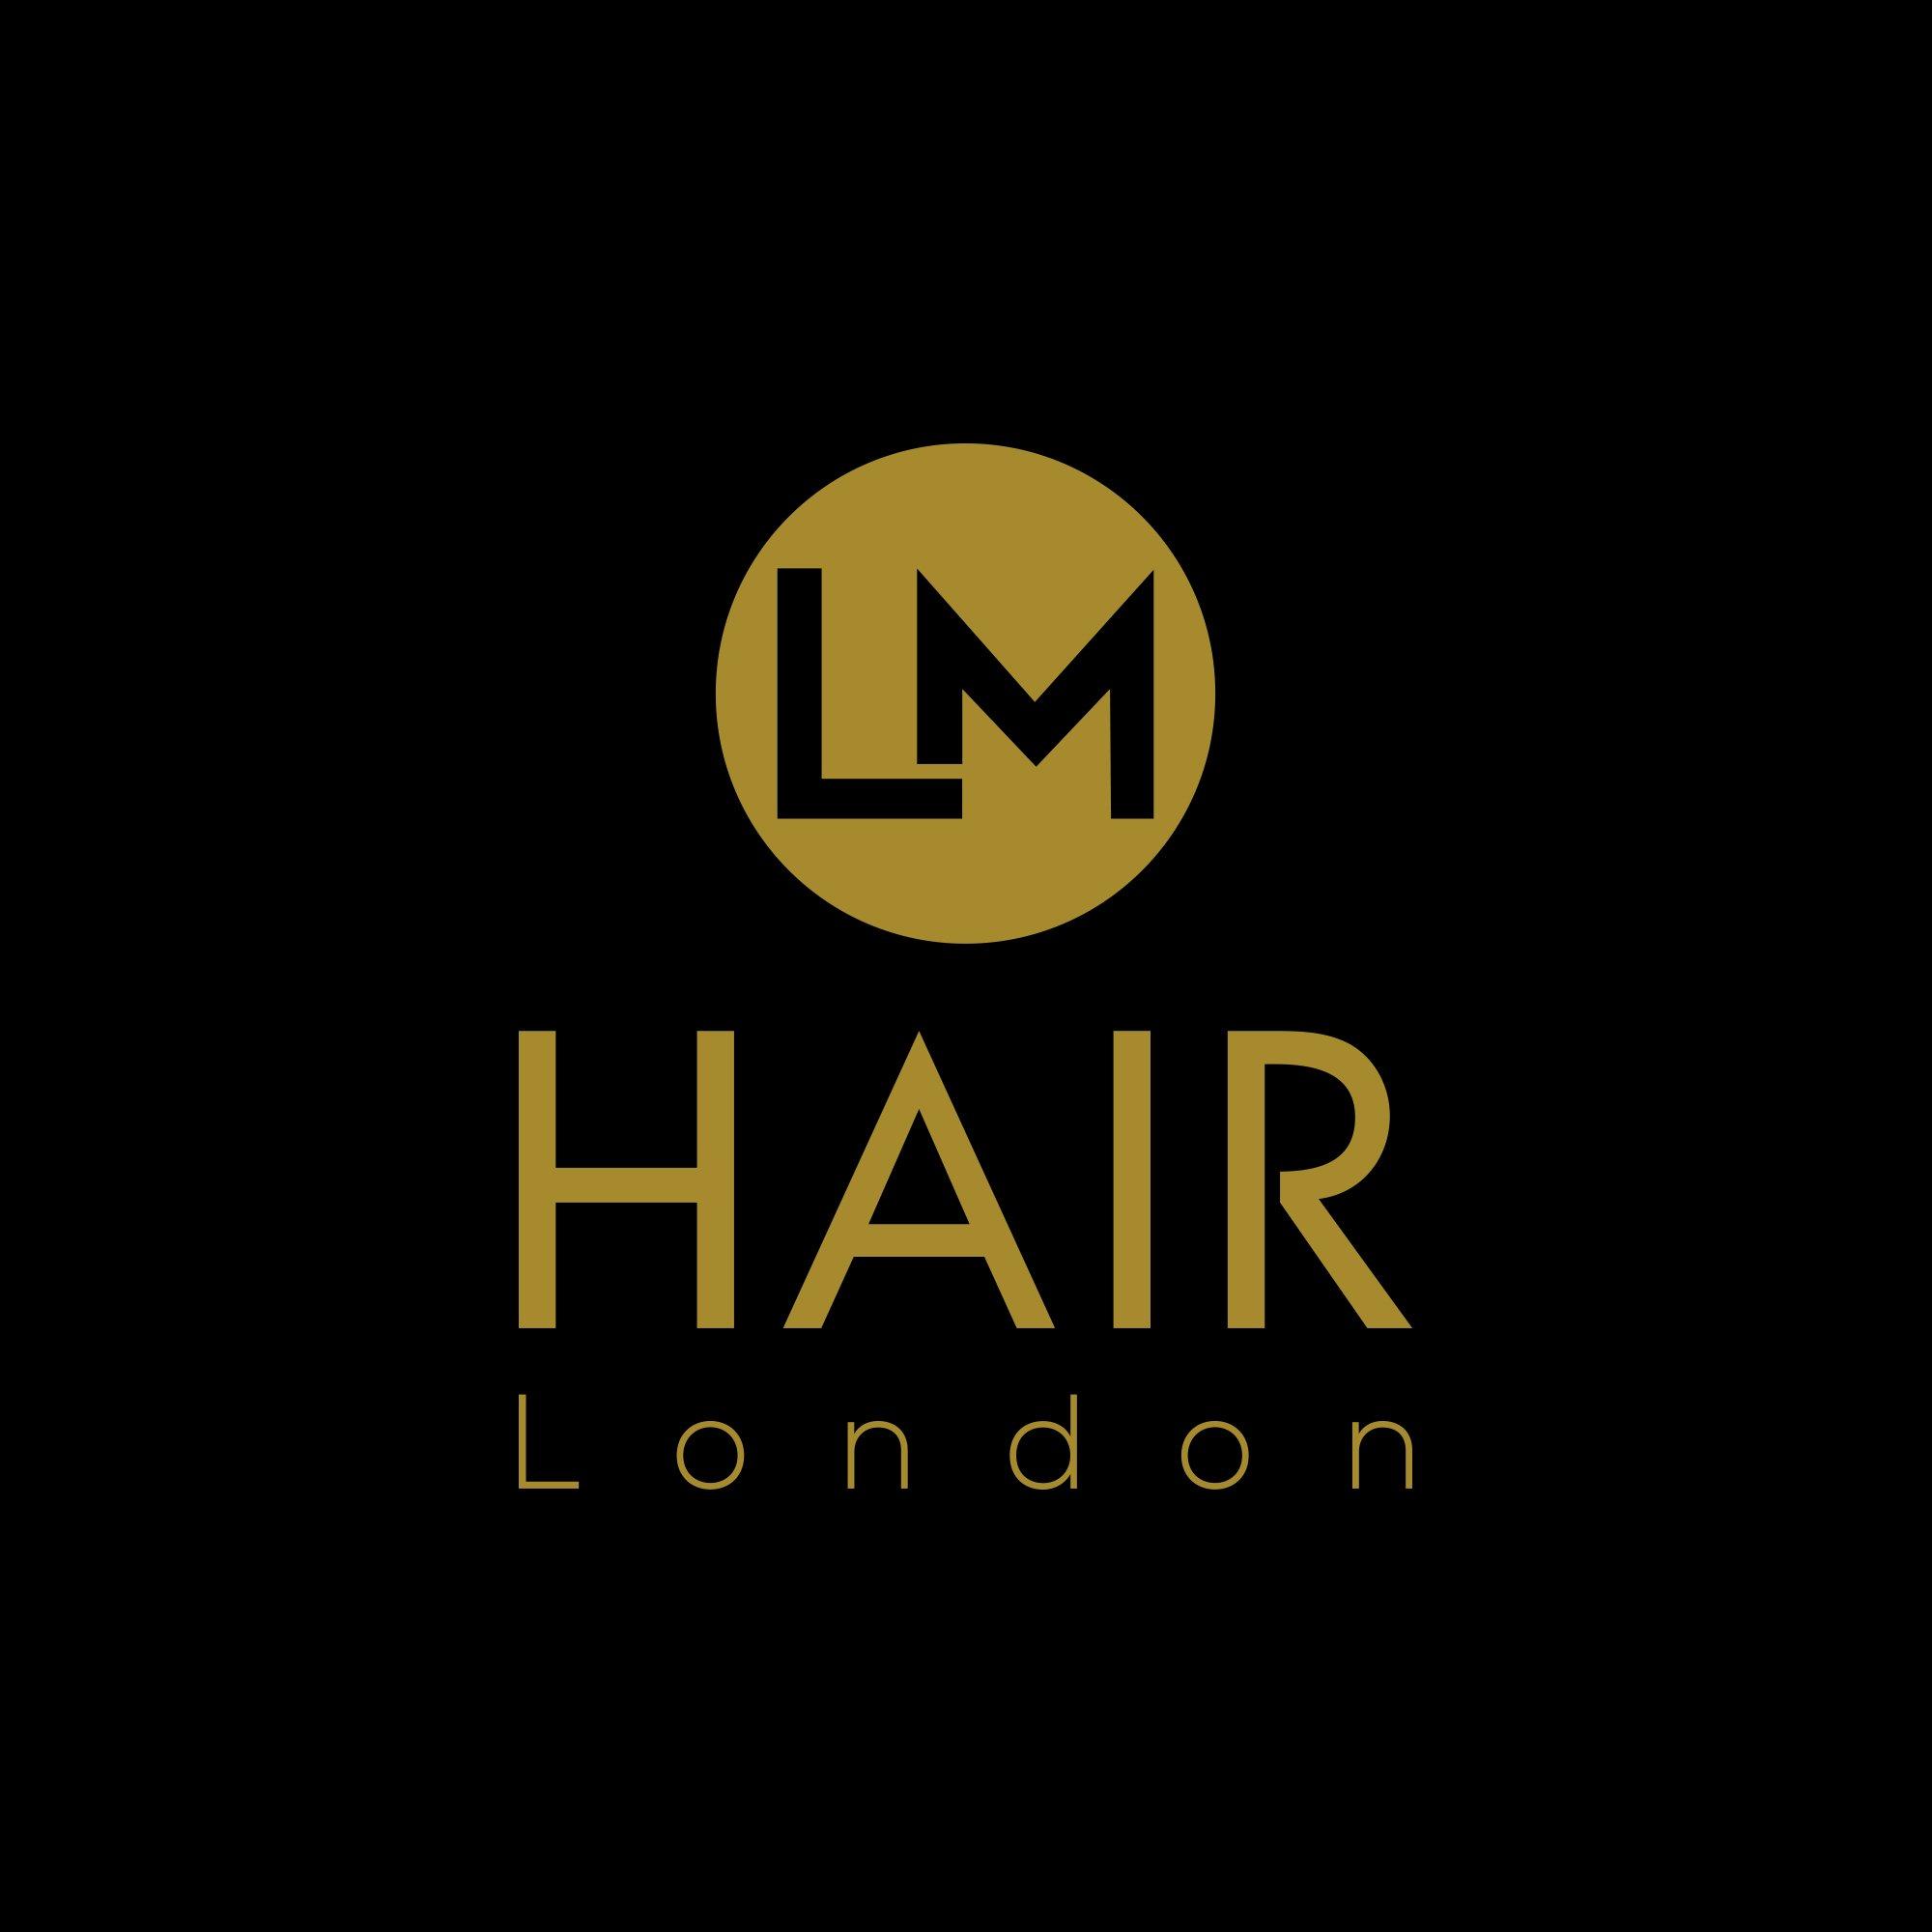 Lm hair london london